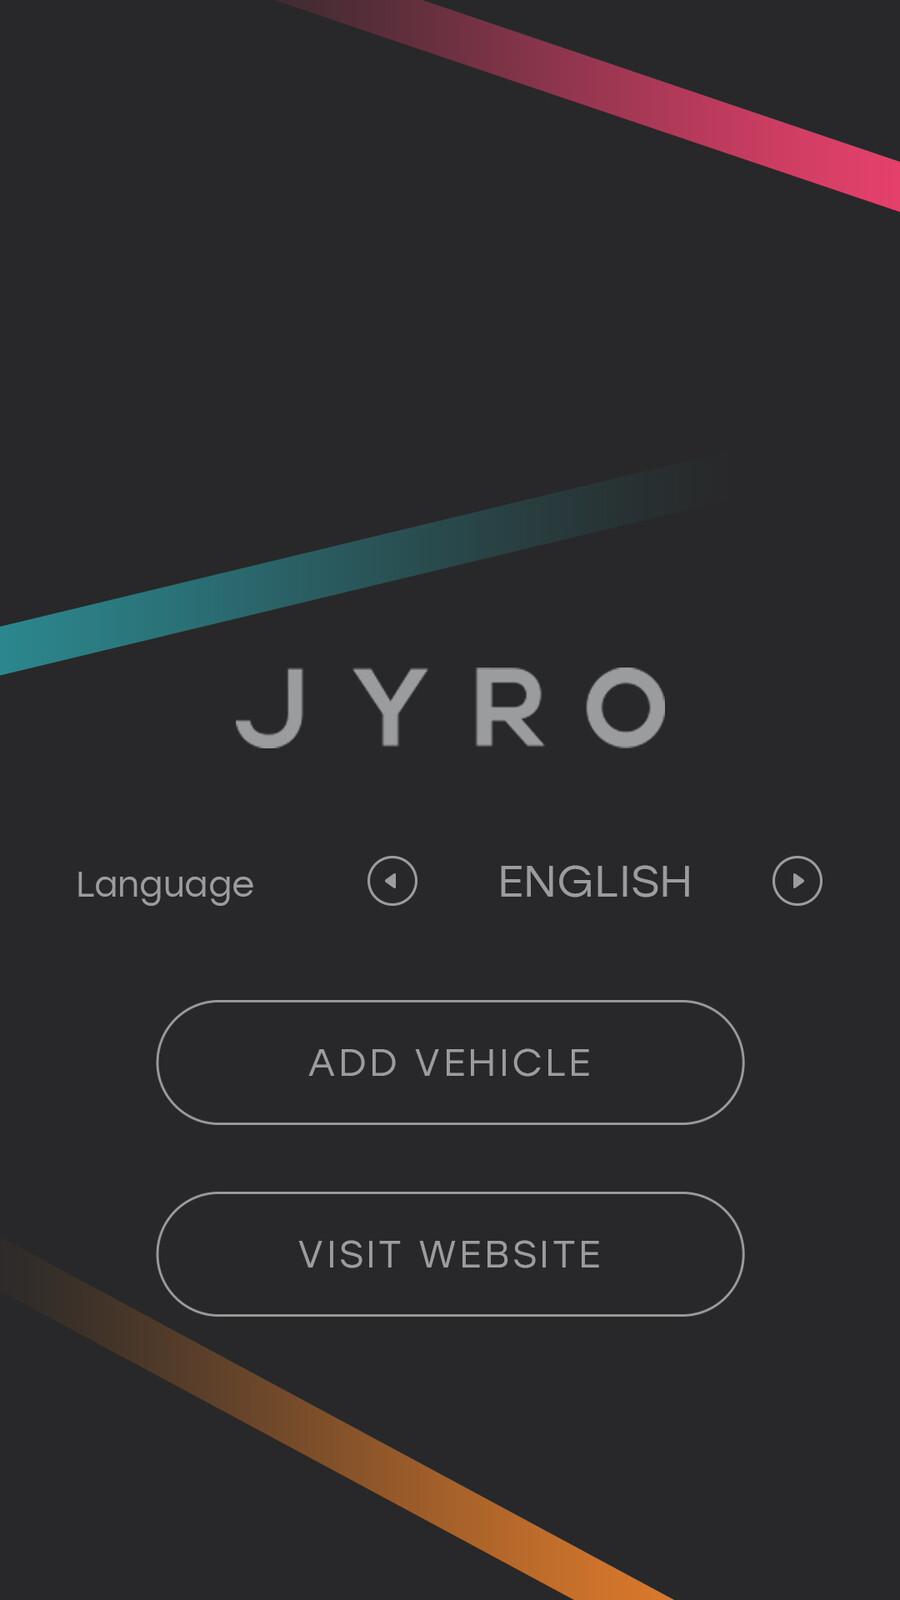 Final UI art for Jyro app.